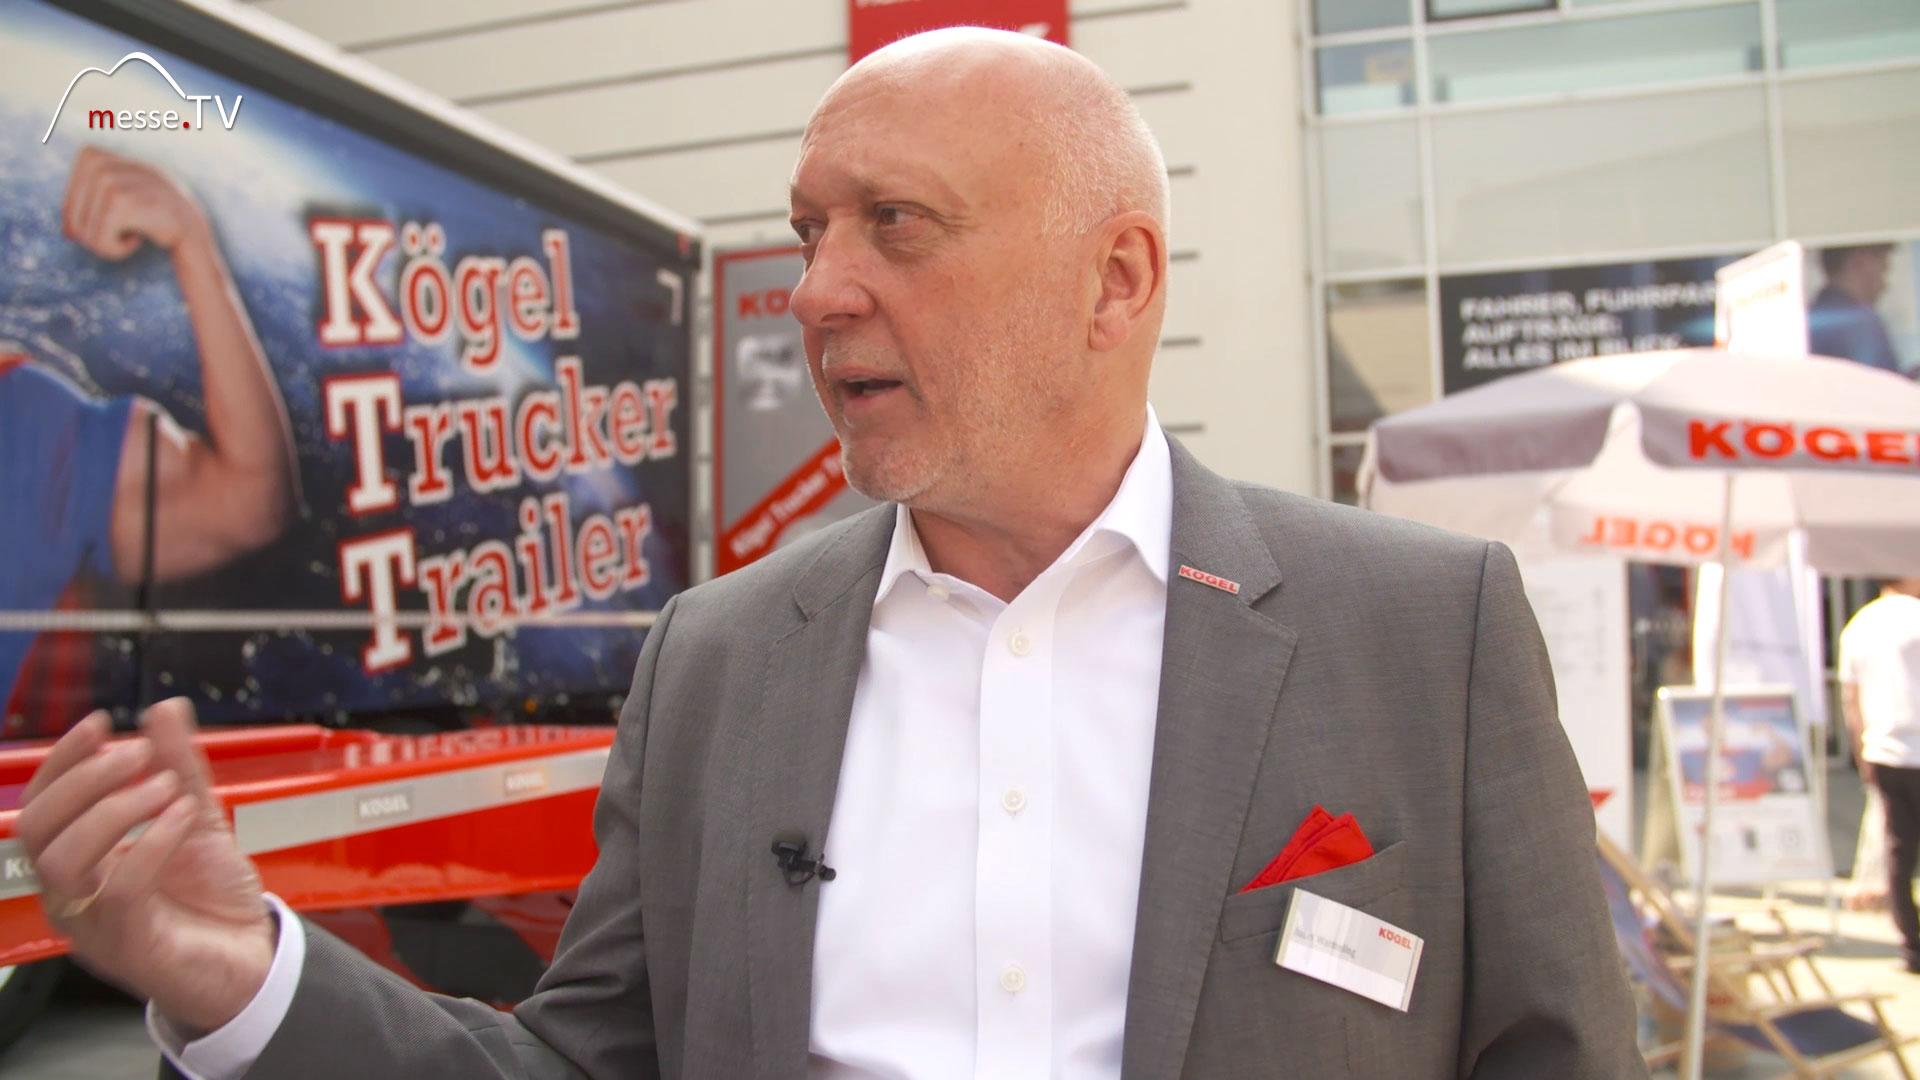 KÖGEL Trailer: Interview Josef Warmeling transport logistic